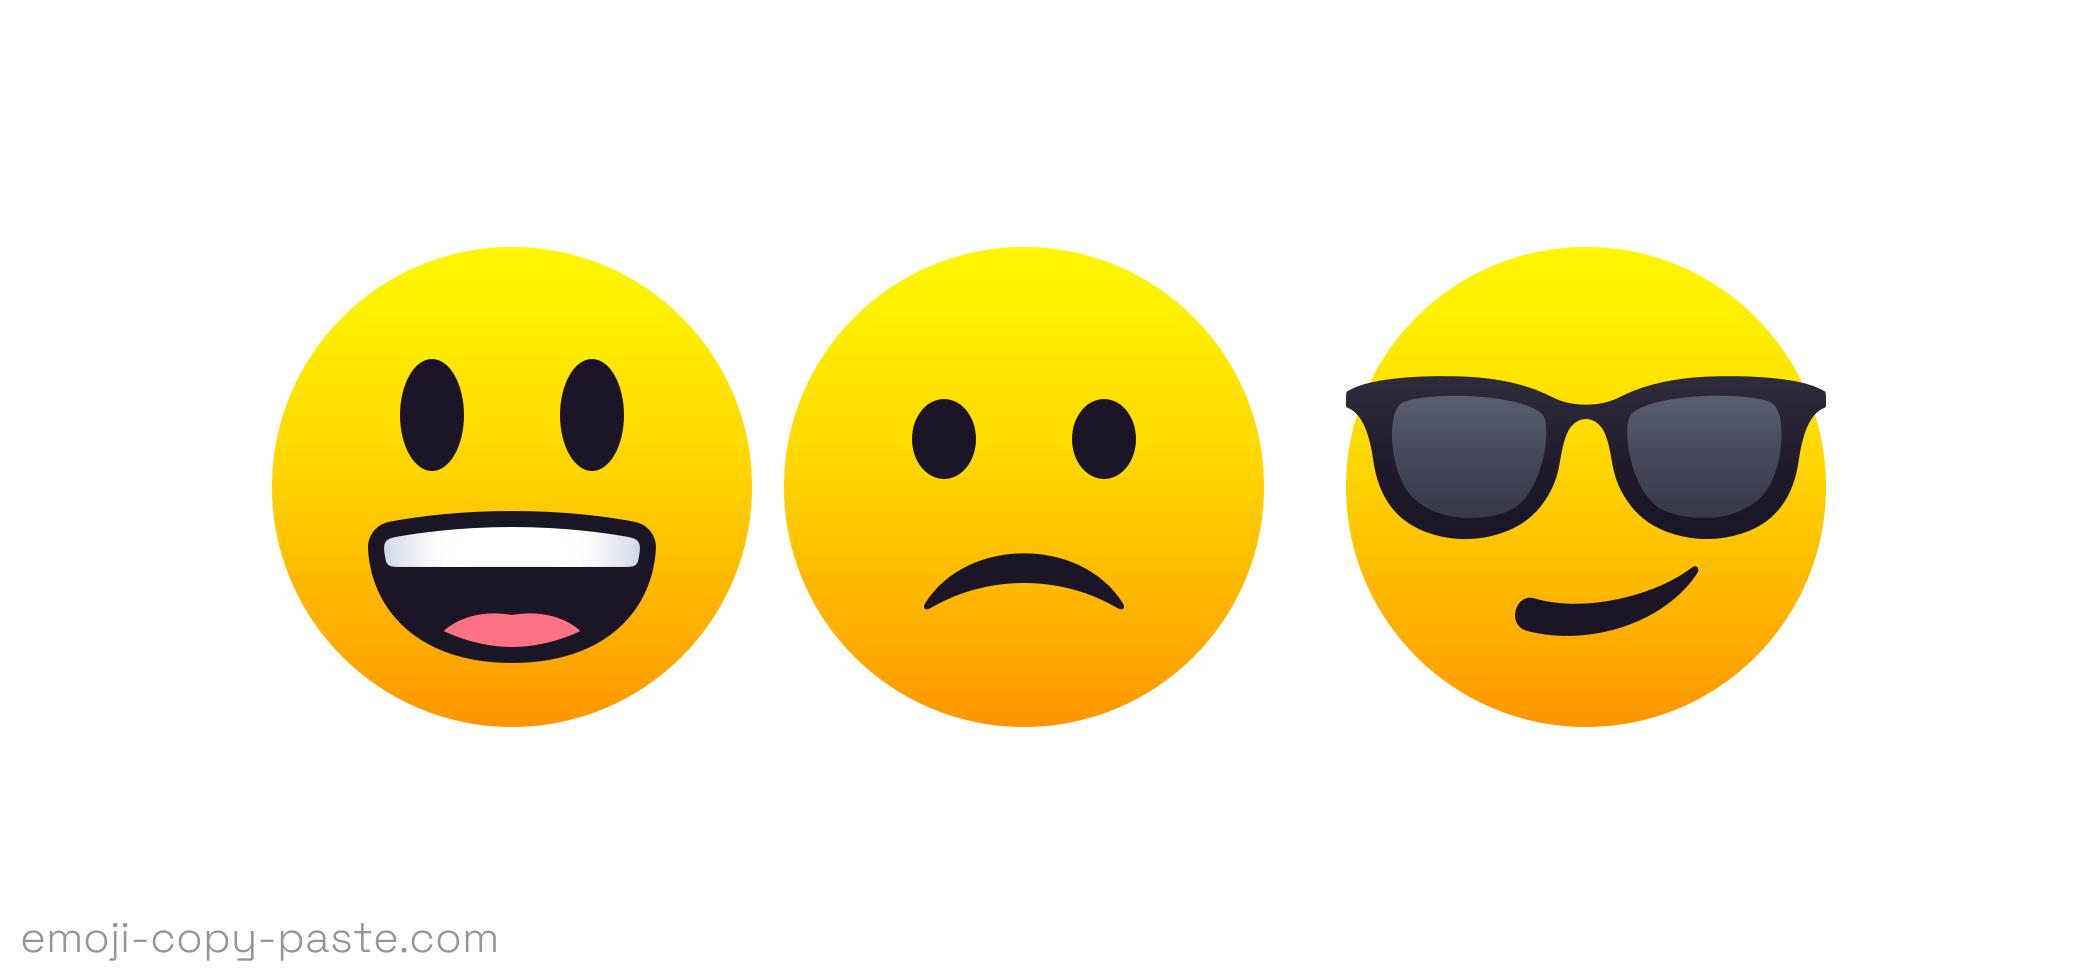 Heart eyes emoji copy and paste